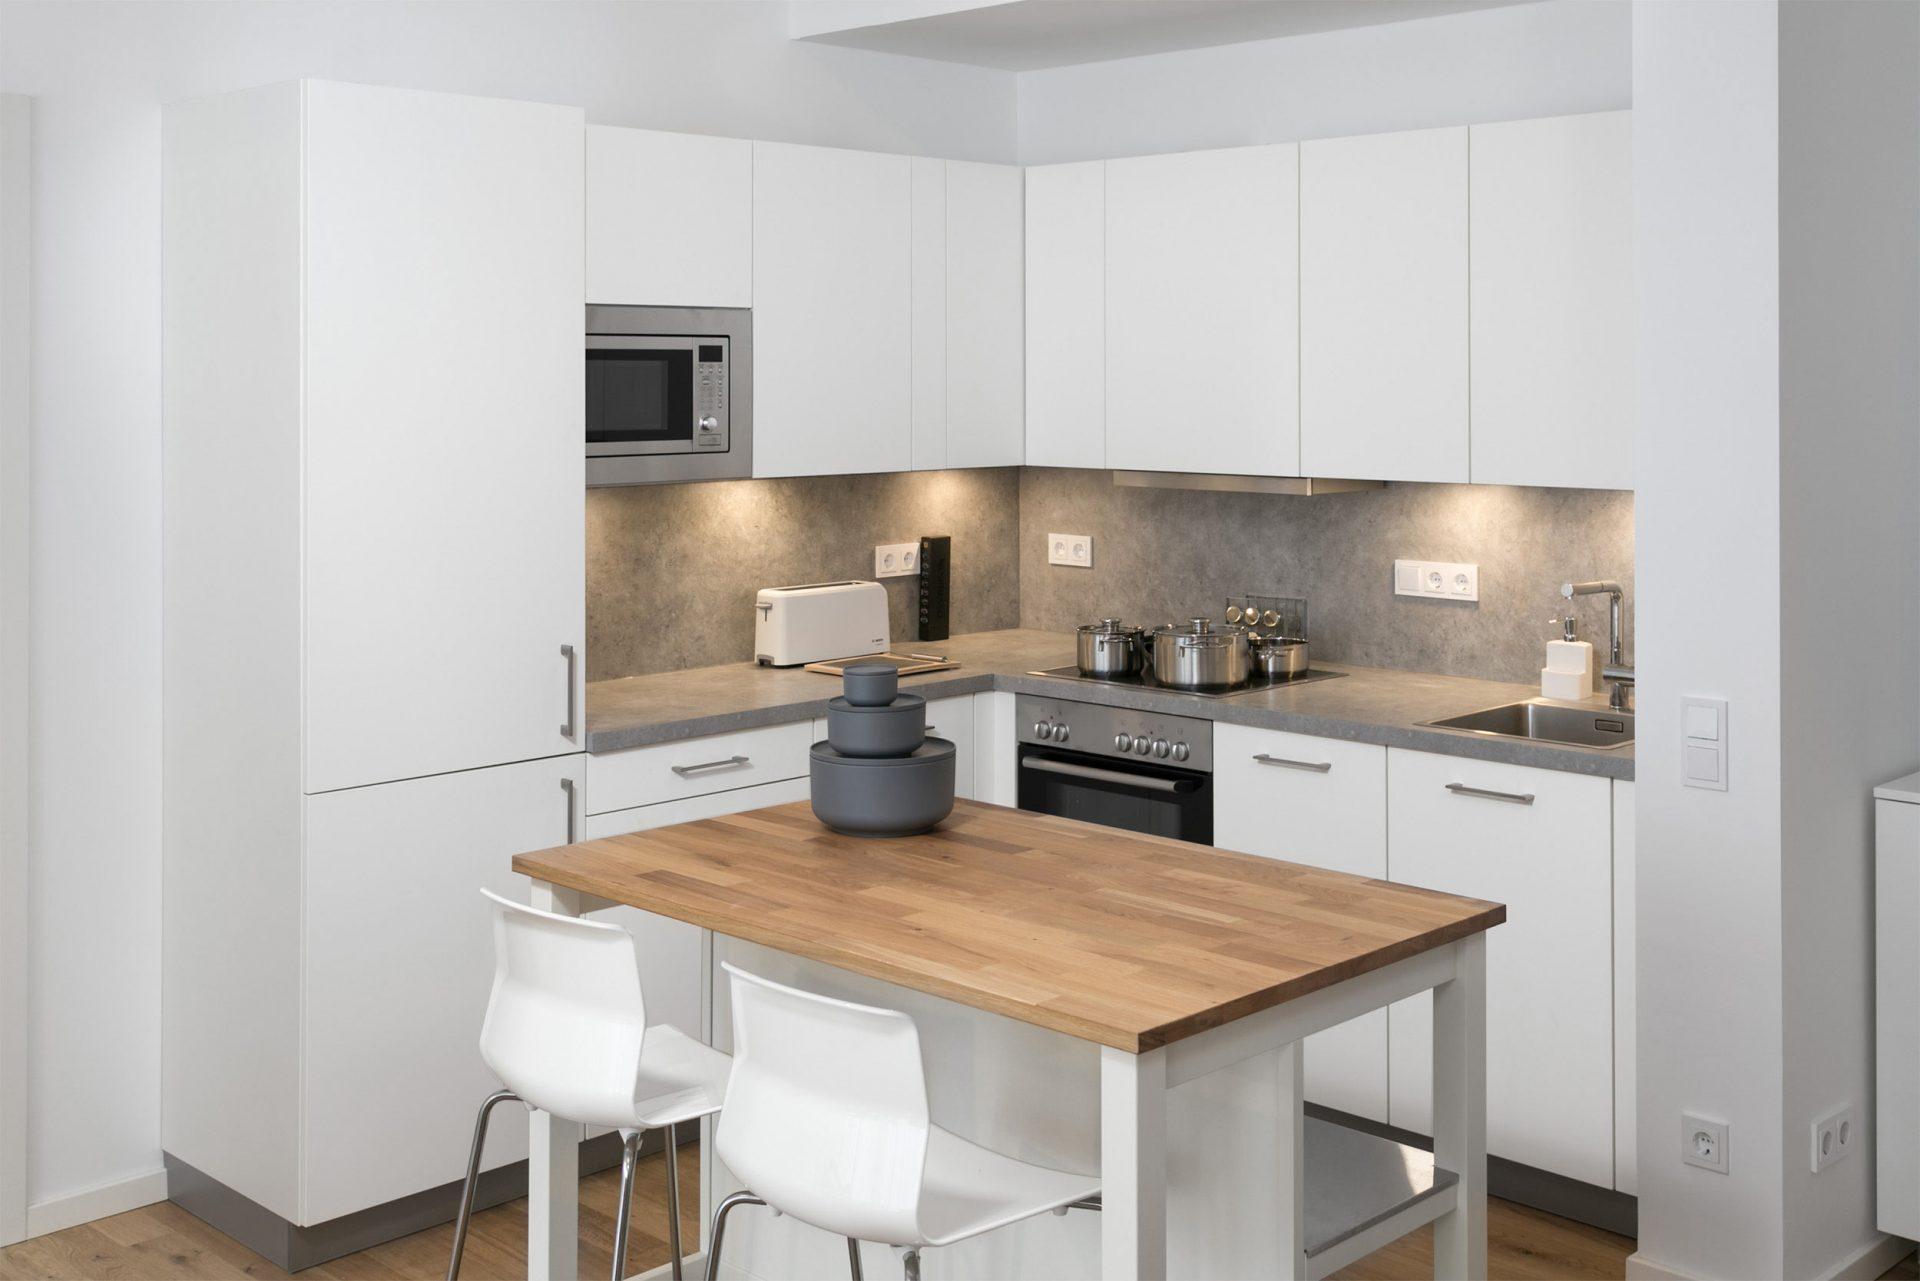 Immobilienfotografie Küche ©offenblende.de